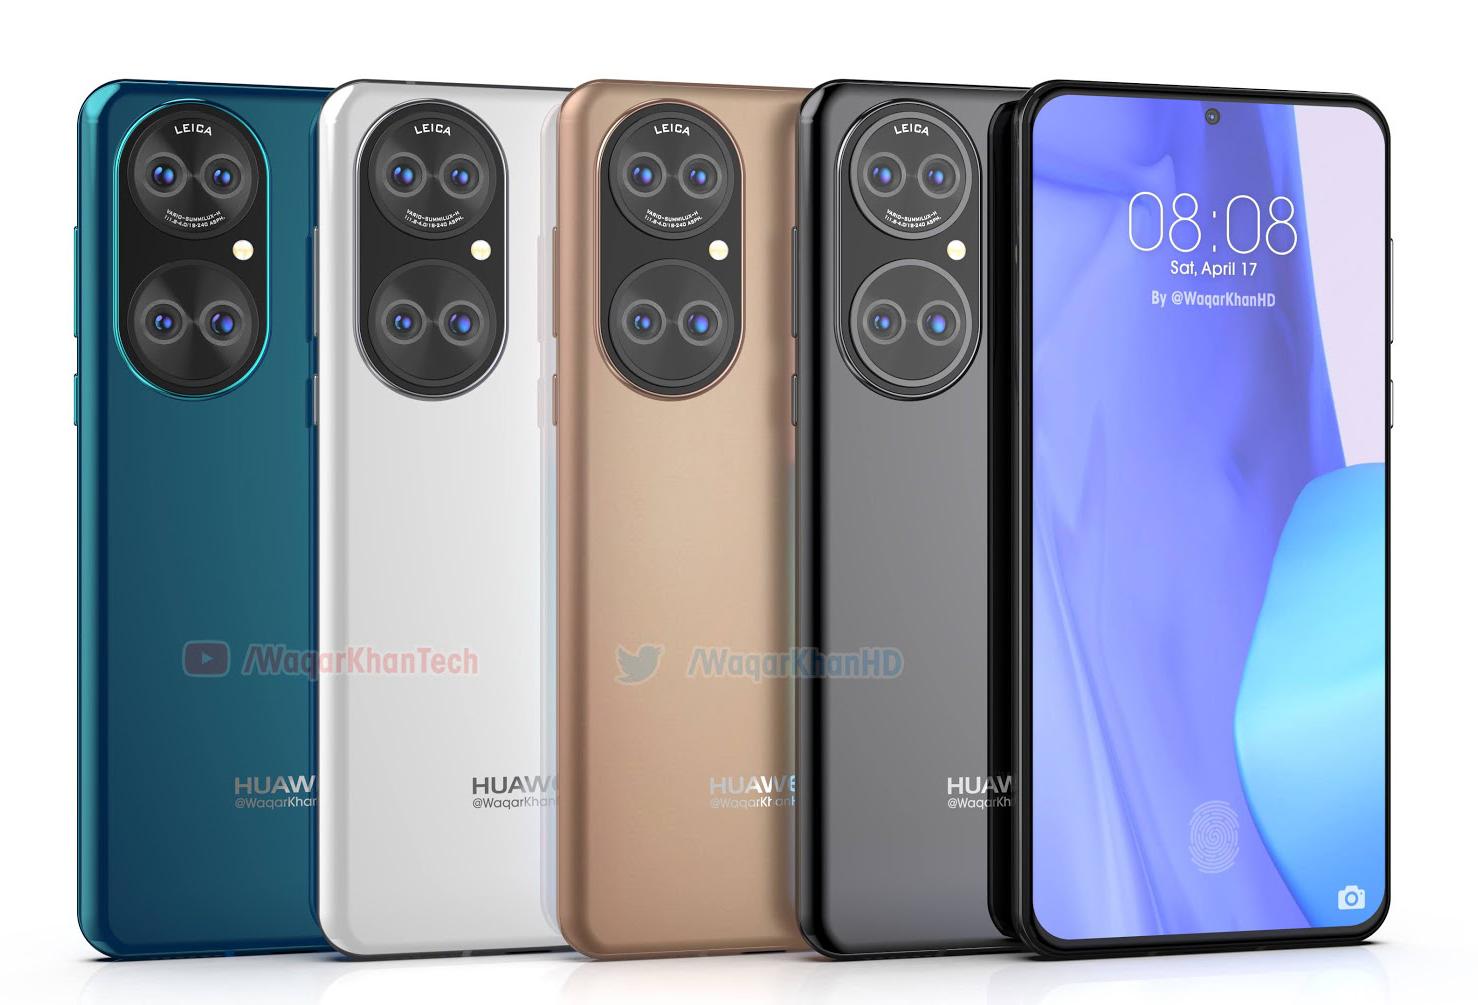 Качественные макеты Huawei P50 Huawei  - huawei_p50_pokazalsa_na_realistichnyh_renederah_video_picture6_2